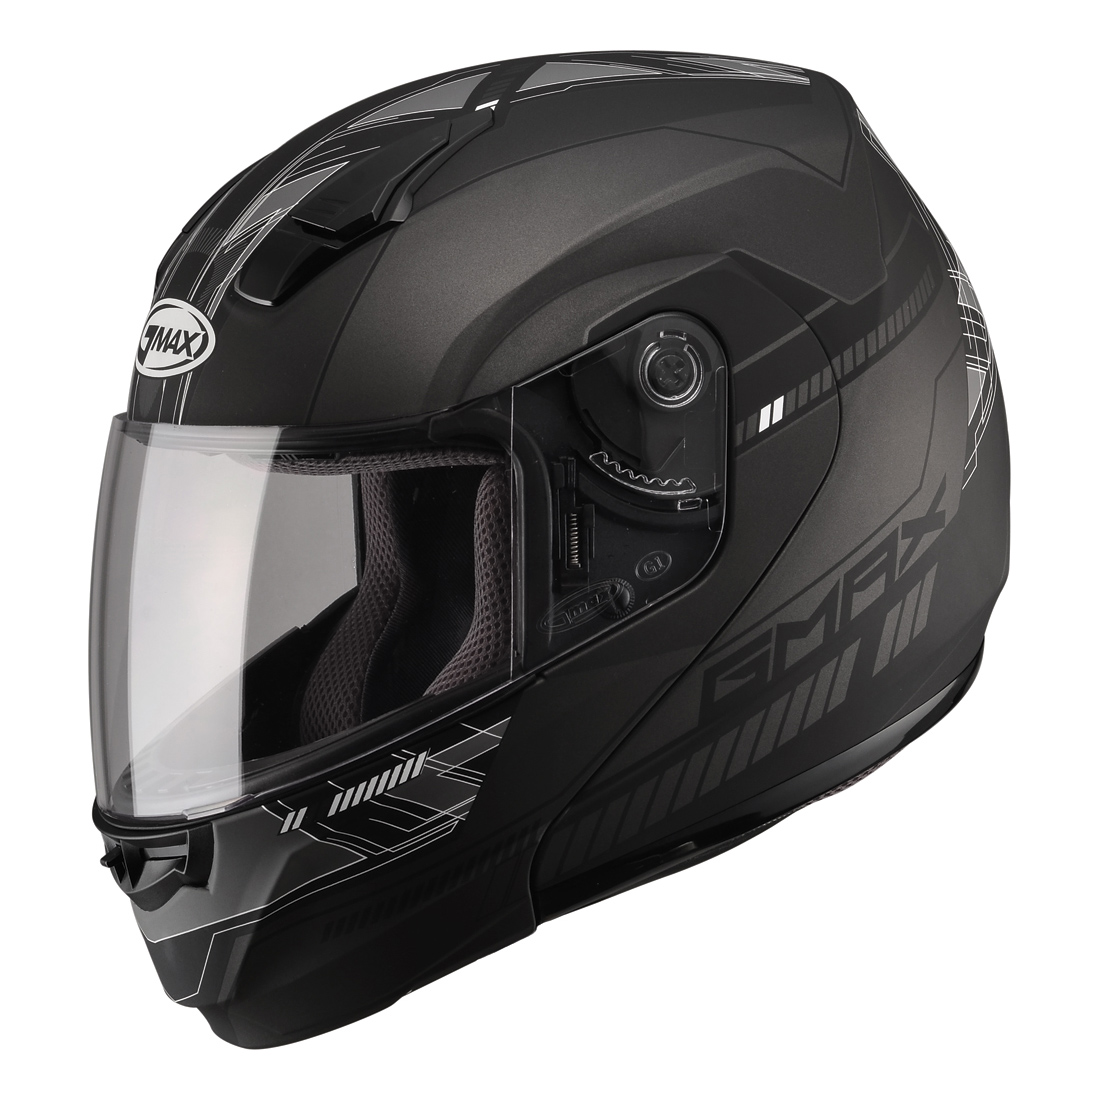 GMAX MD04 Dark Silver Modular Helmet